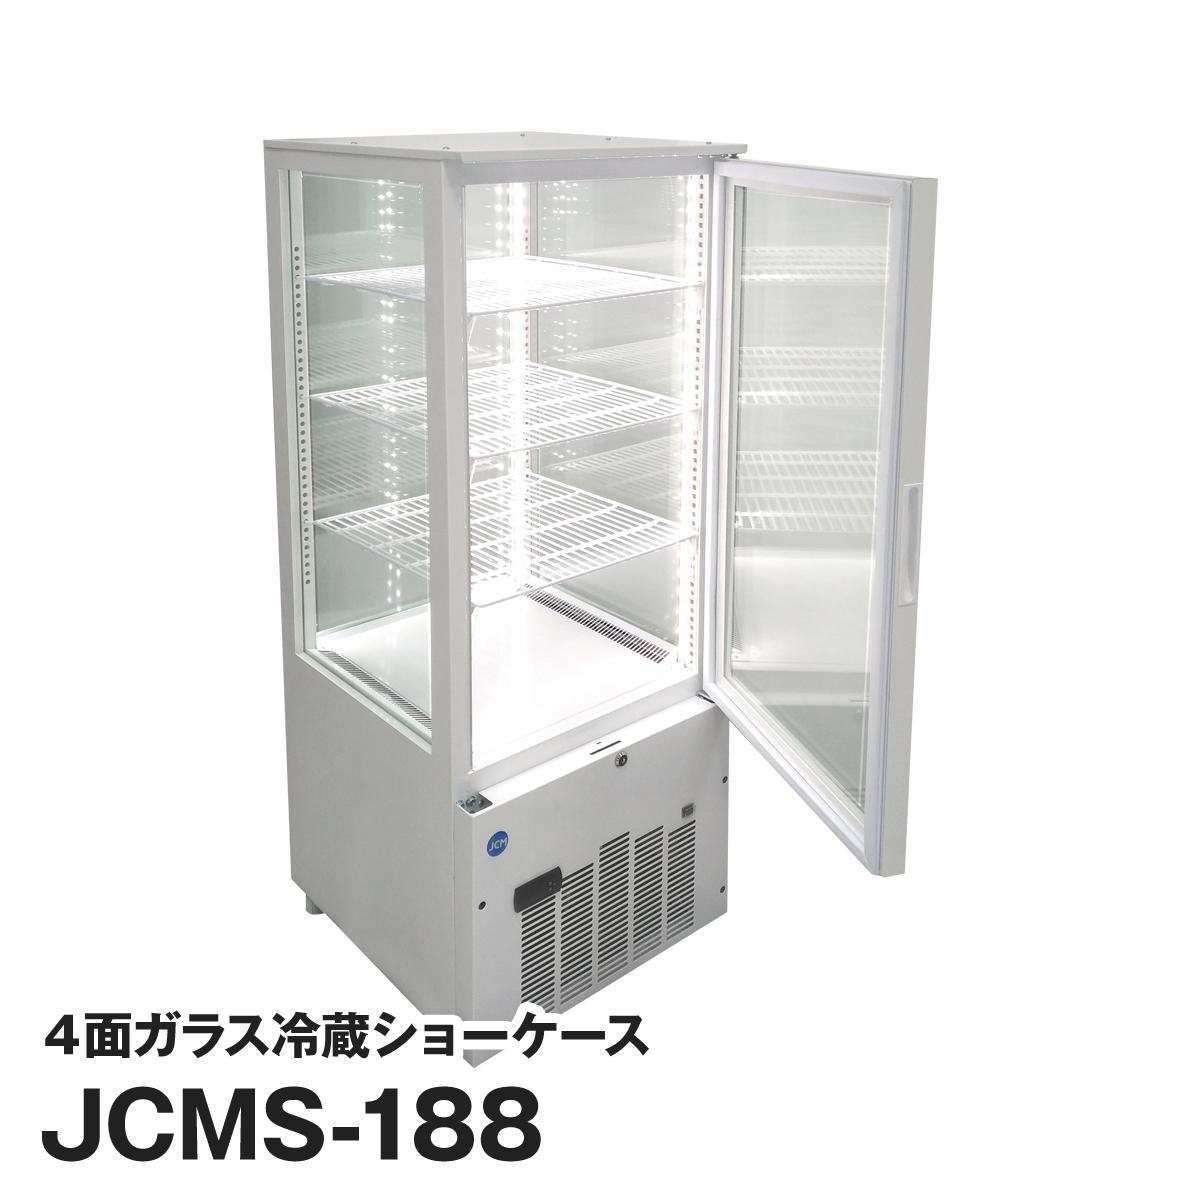 JCM社製 業務用 保冷庫 冷蔵庫 188L 4面 ガラス 冷蔵 ショーケース JCMS-188 新品